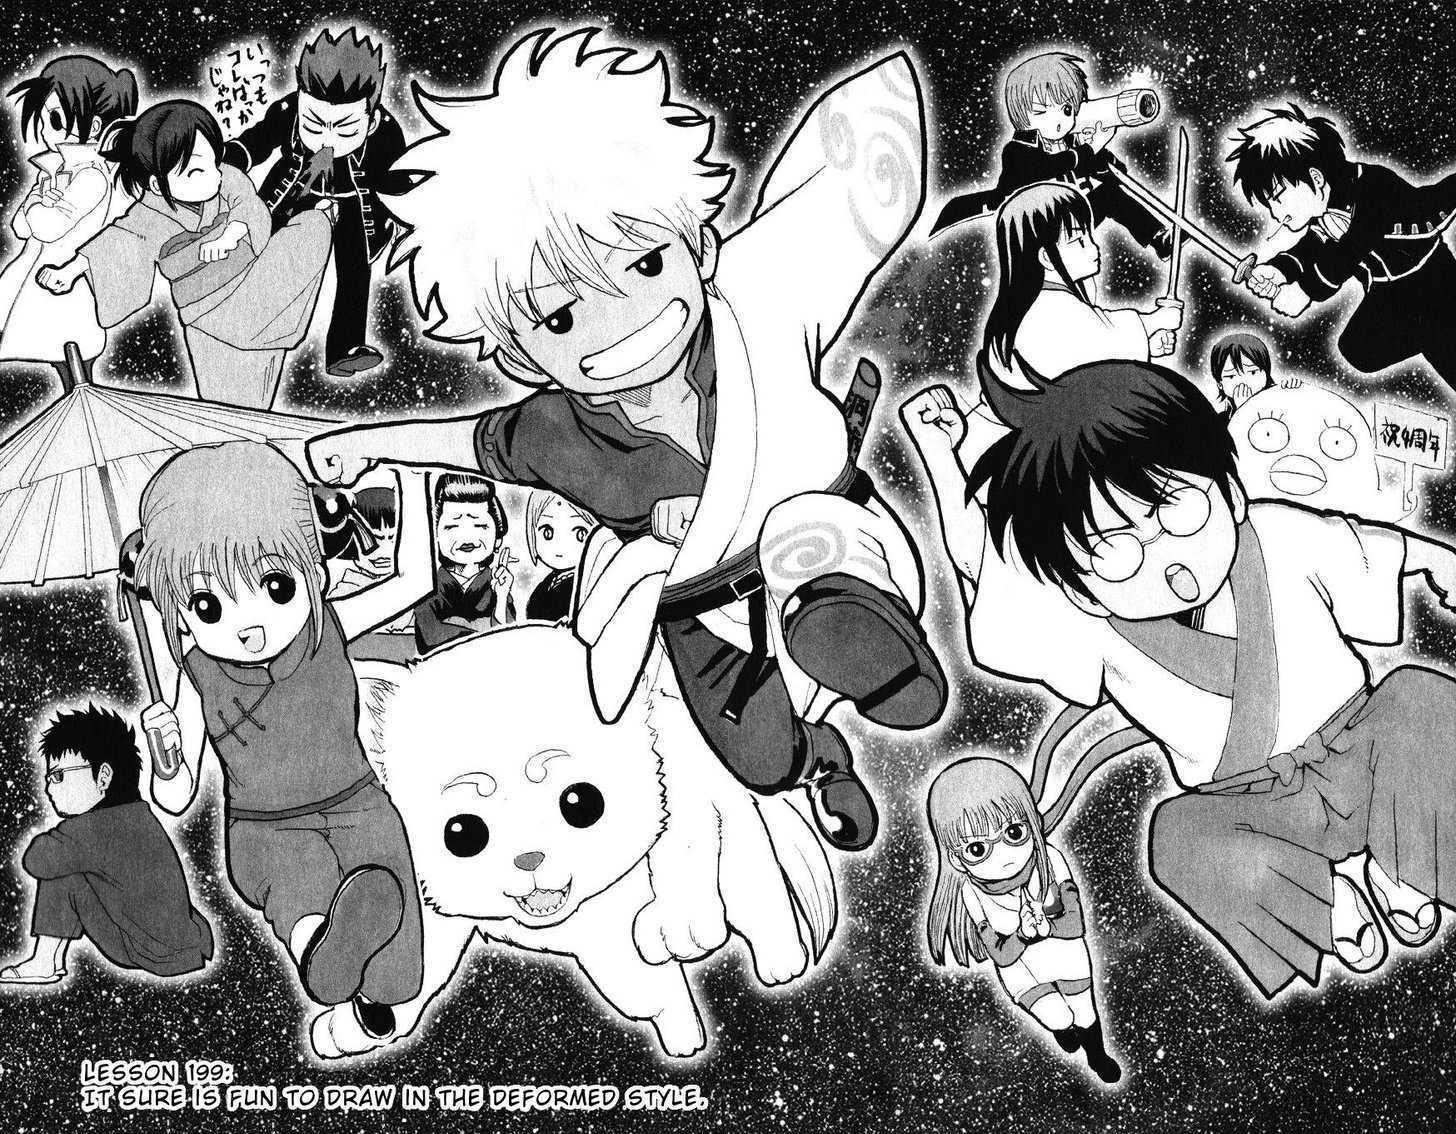 https://im.nineanime.com/comics/pic9/18/210/16786/Gintama1990579.jpg Page 1